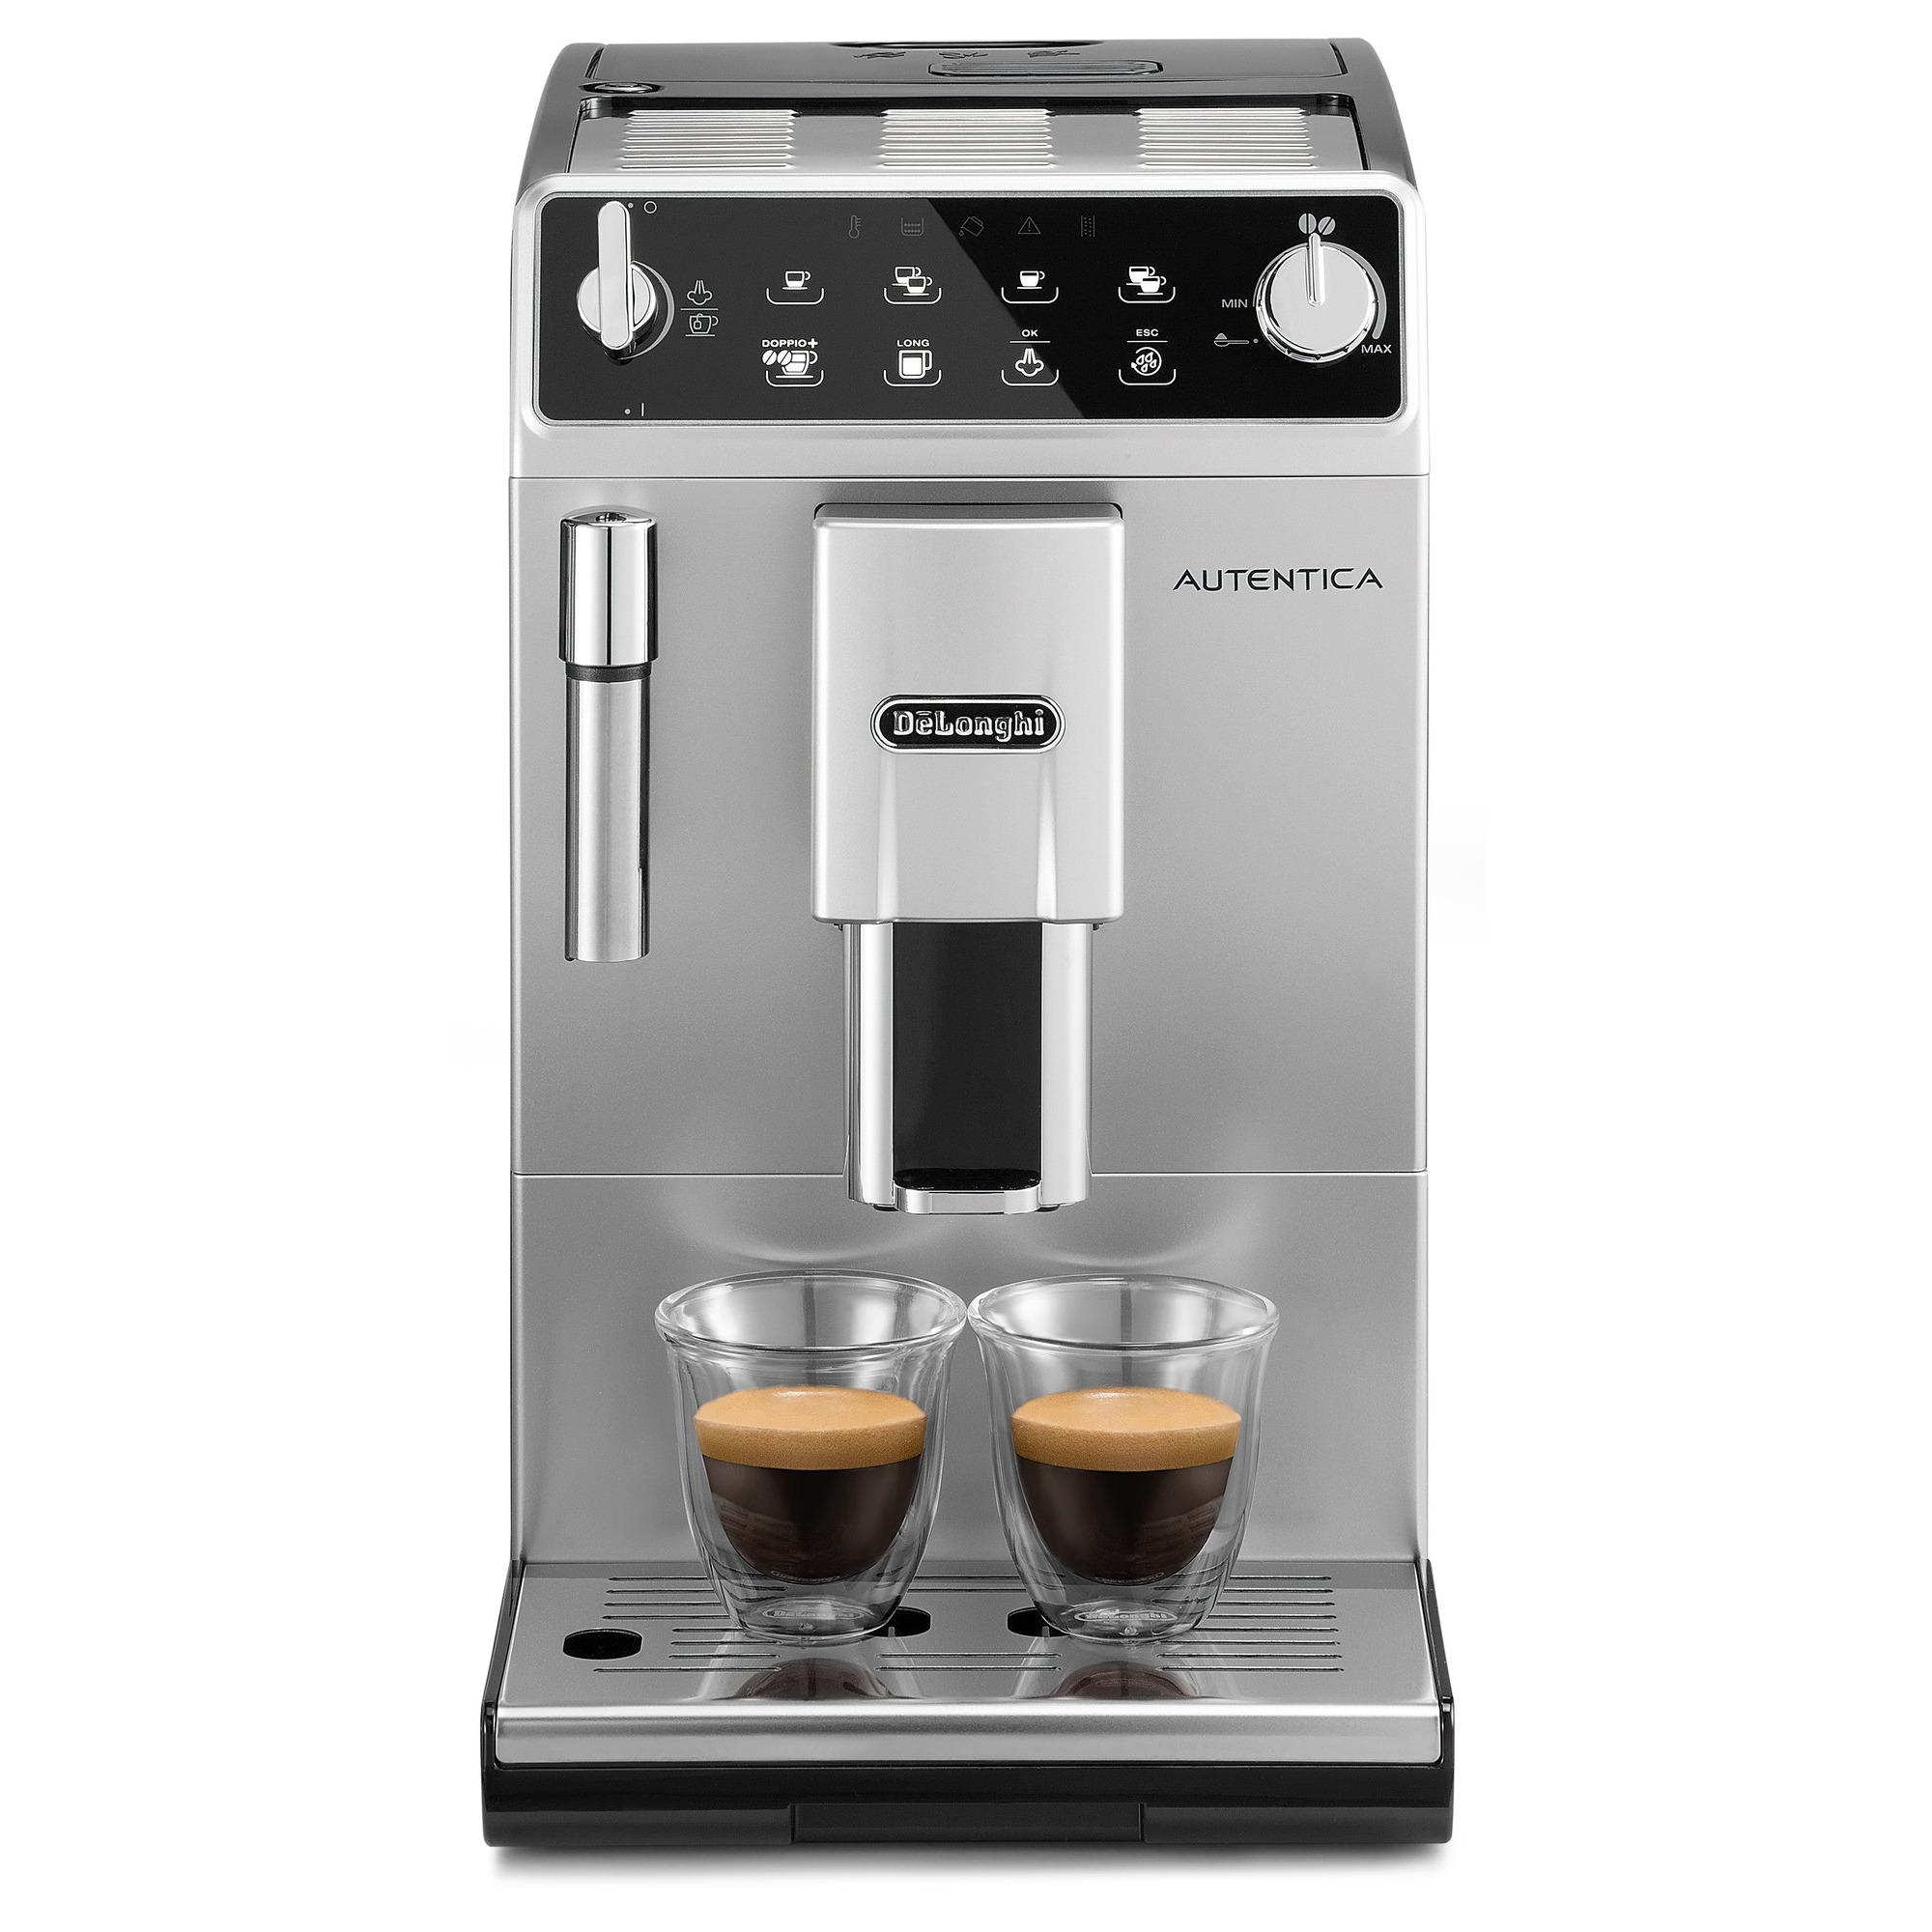 DeLonghi ETAM 29.510.B espressomaskin